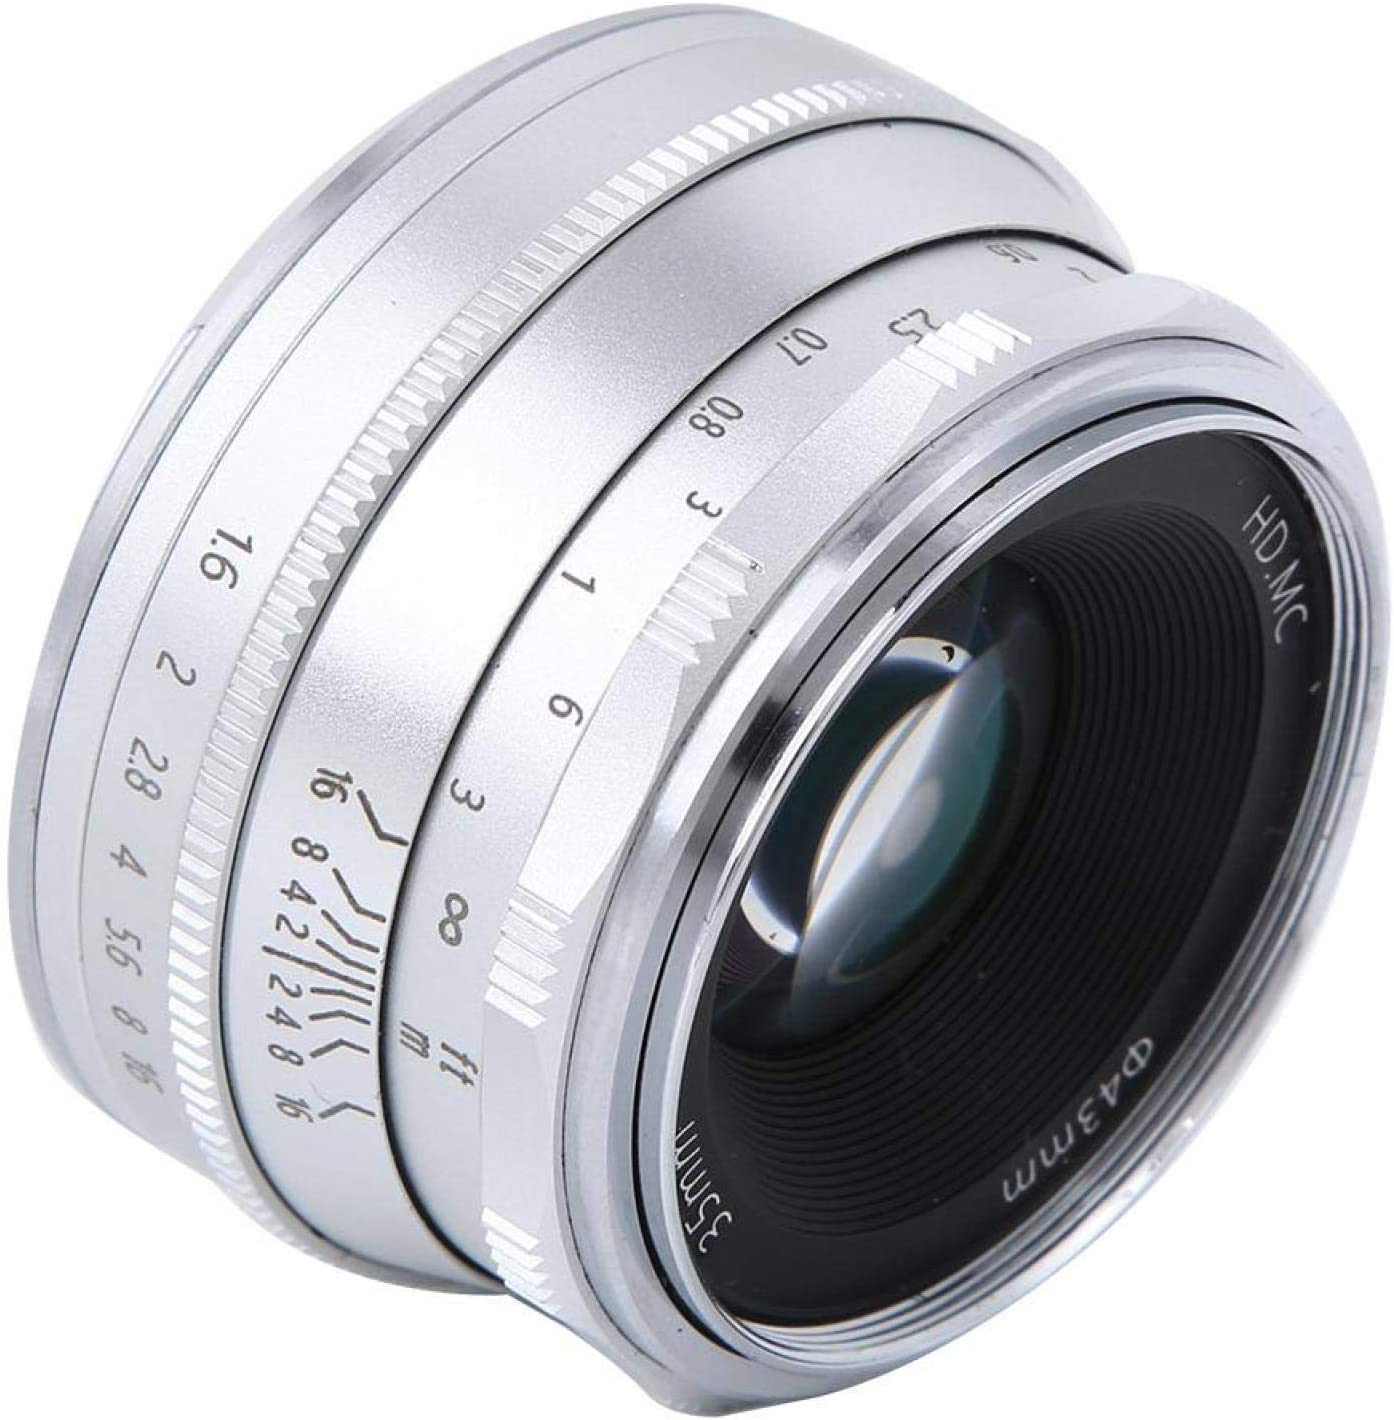 Eosnow Mirrorless Ranking TOP11 Outlet SALE Camera Lens Z6 for Nikon Silver